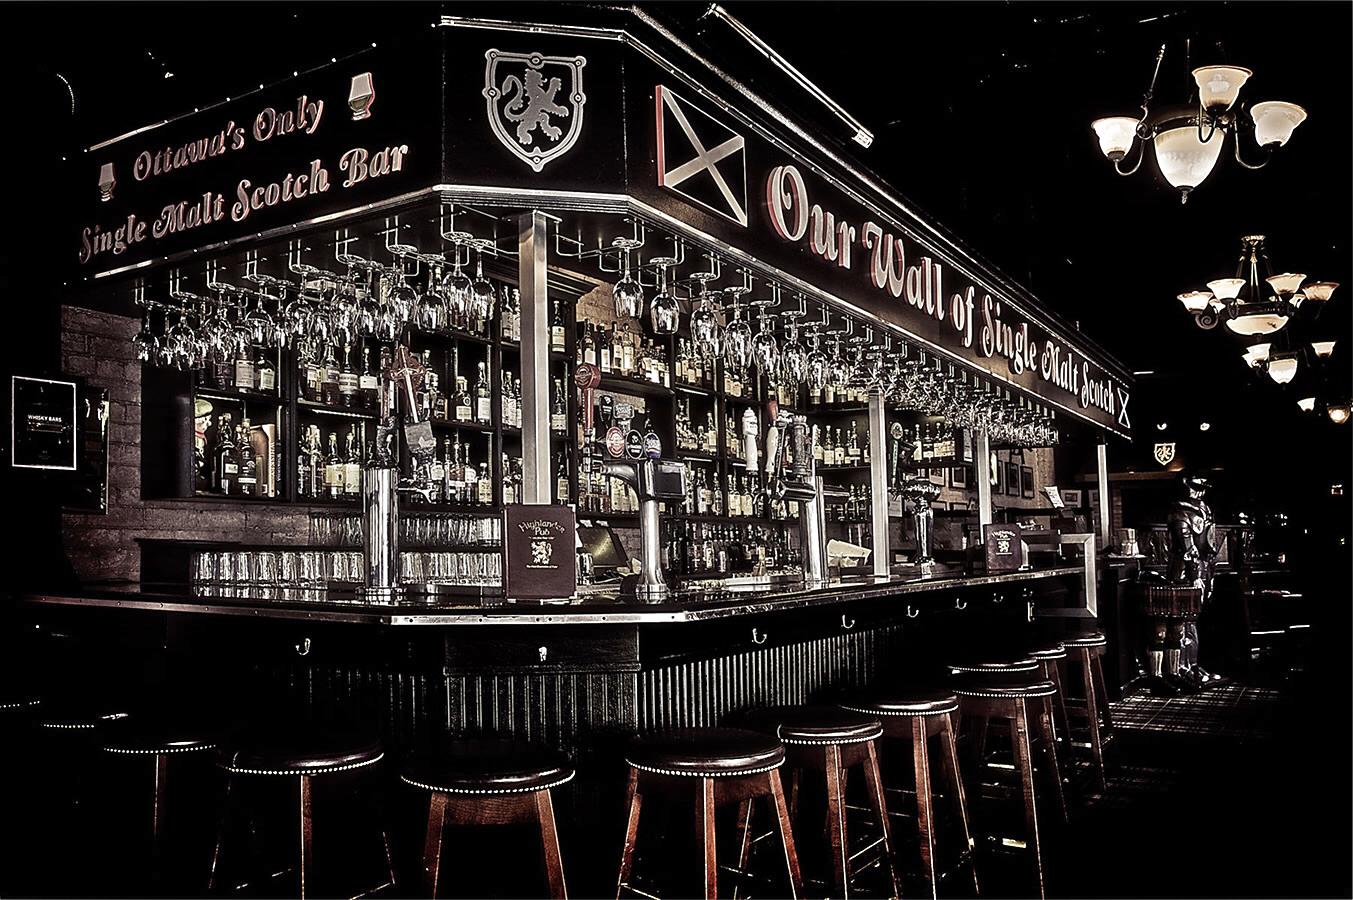 The Highlander Pub Ottawa Whisky Bar